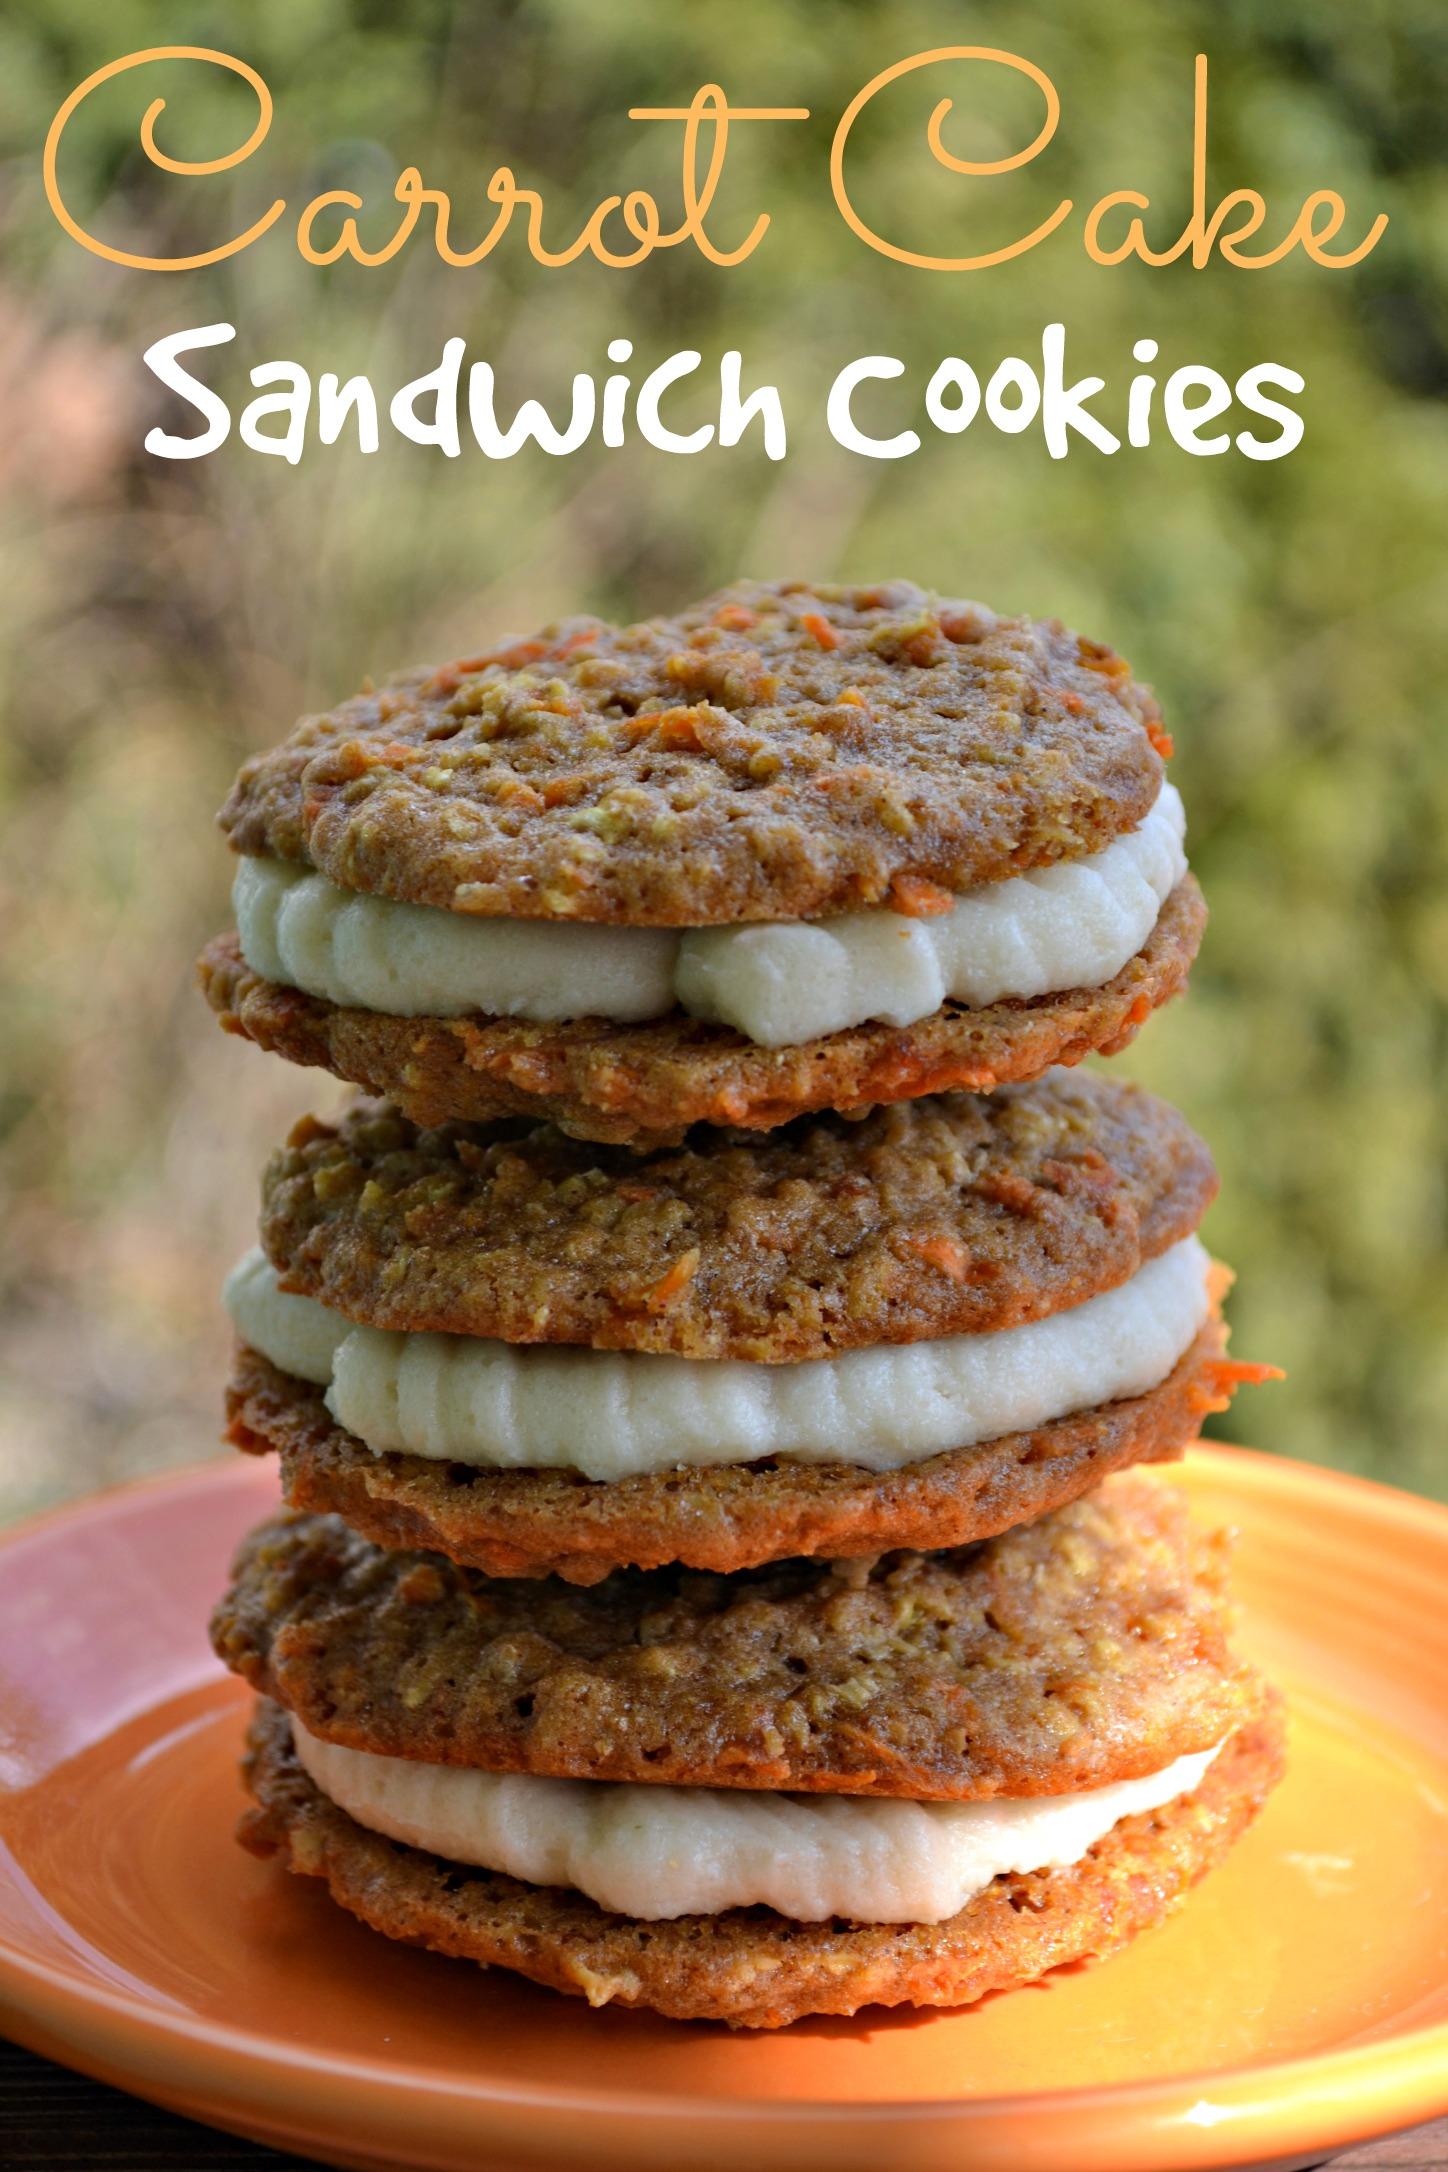 Cookies, Cinnamon Sugar Crumble Recipe Carrot Cake Sandwich Cookies ...